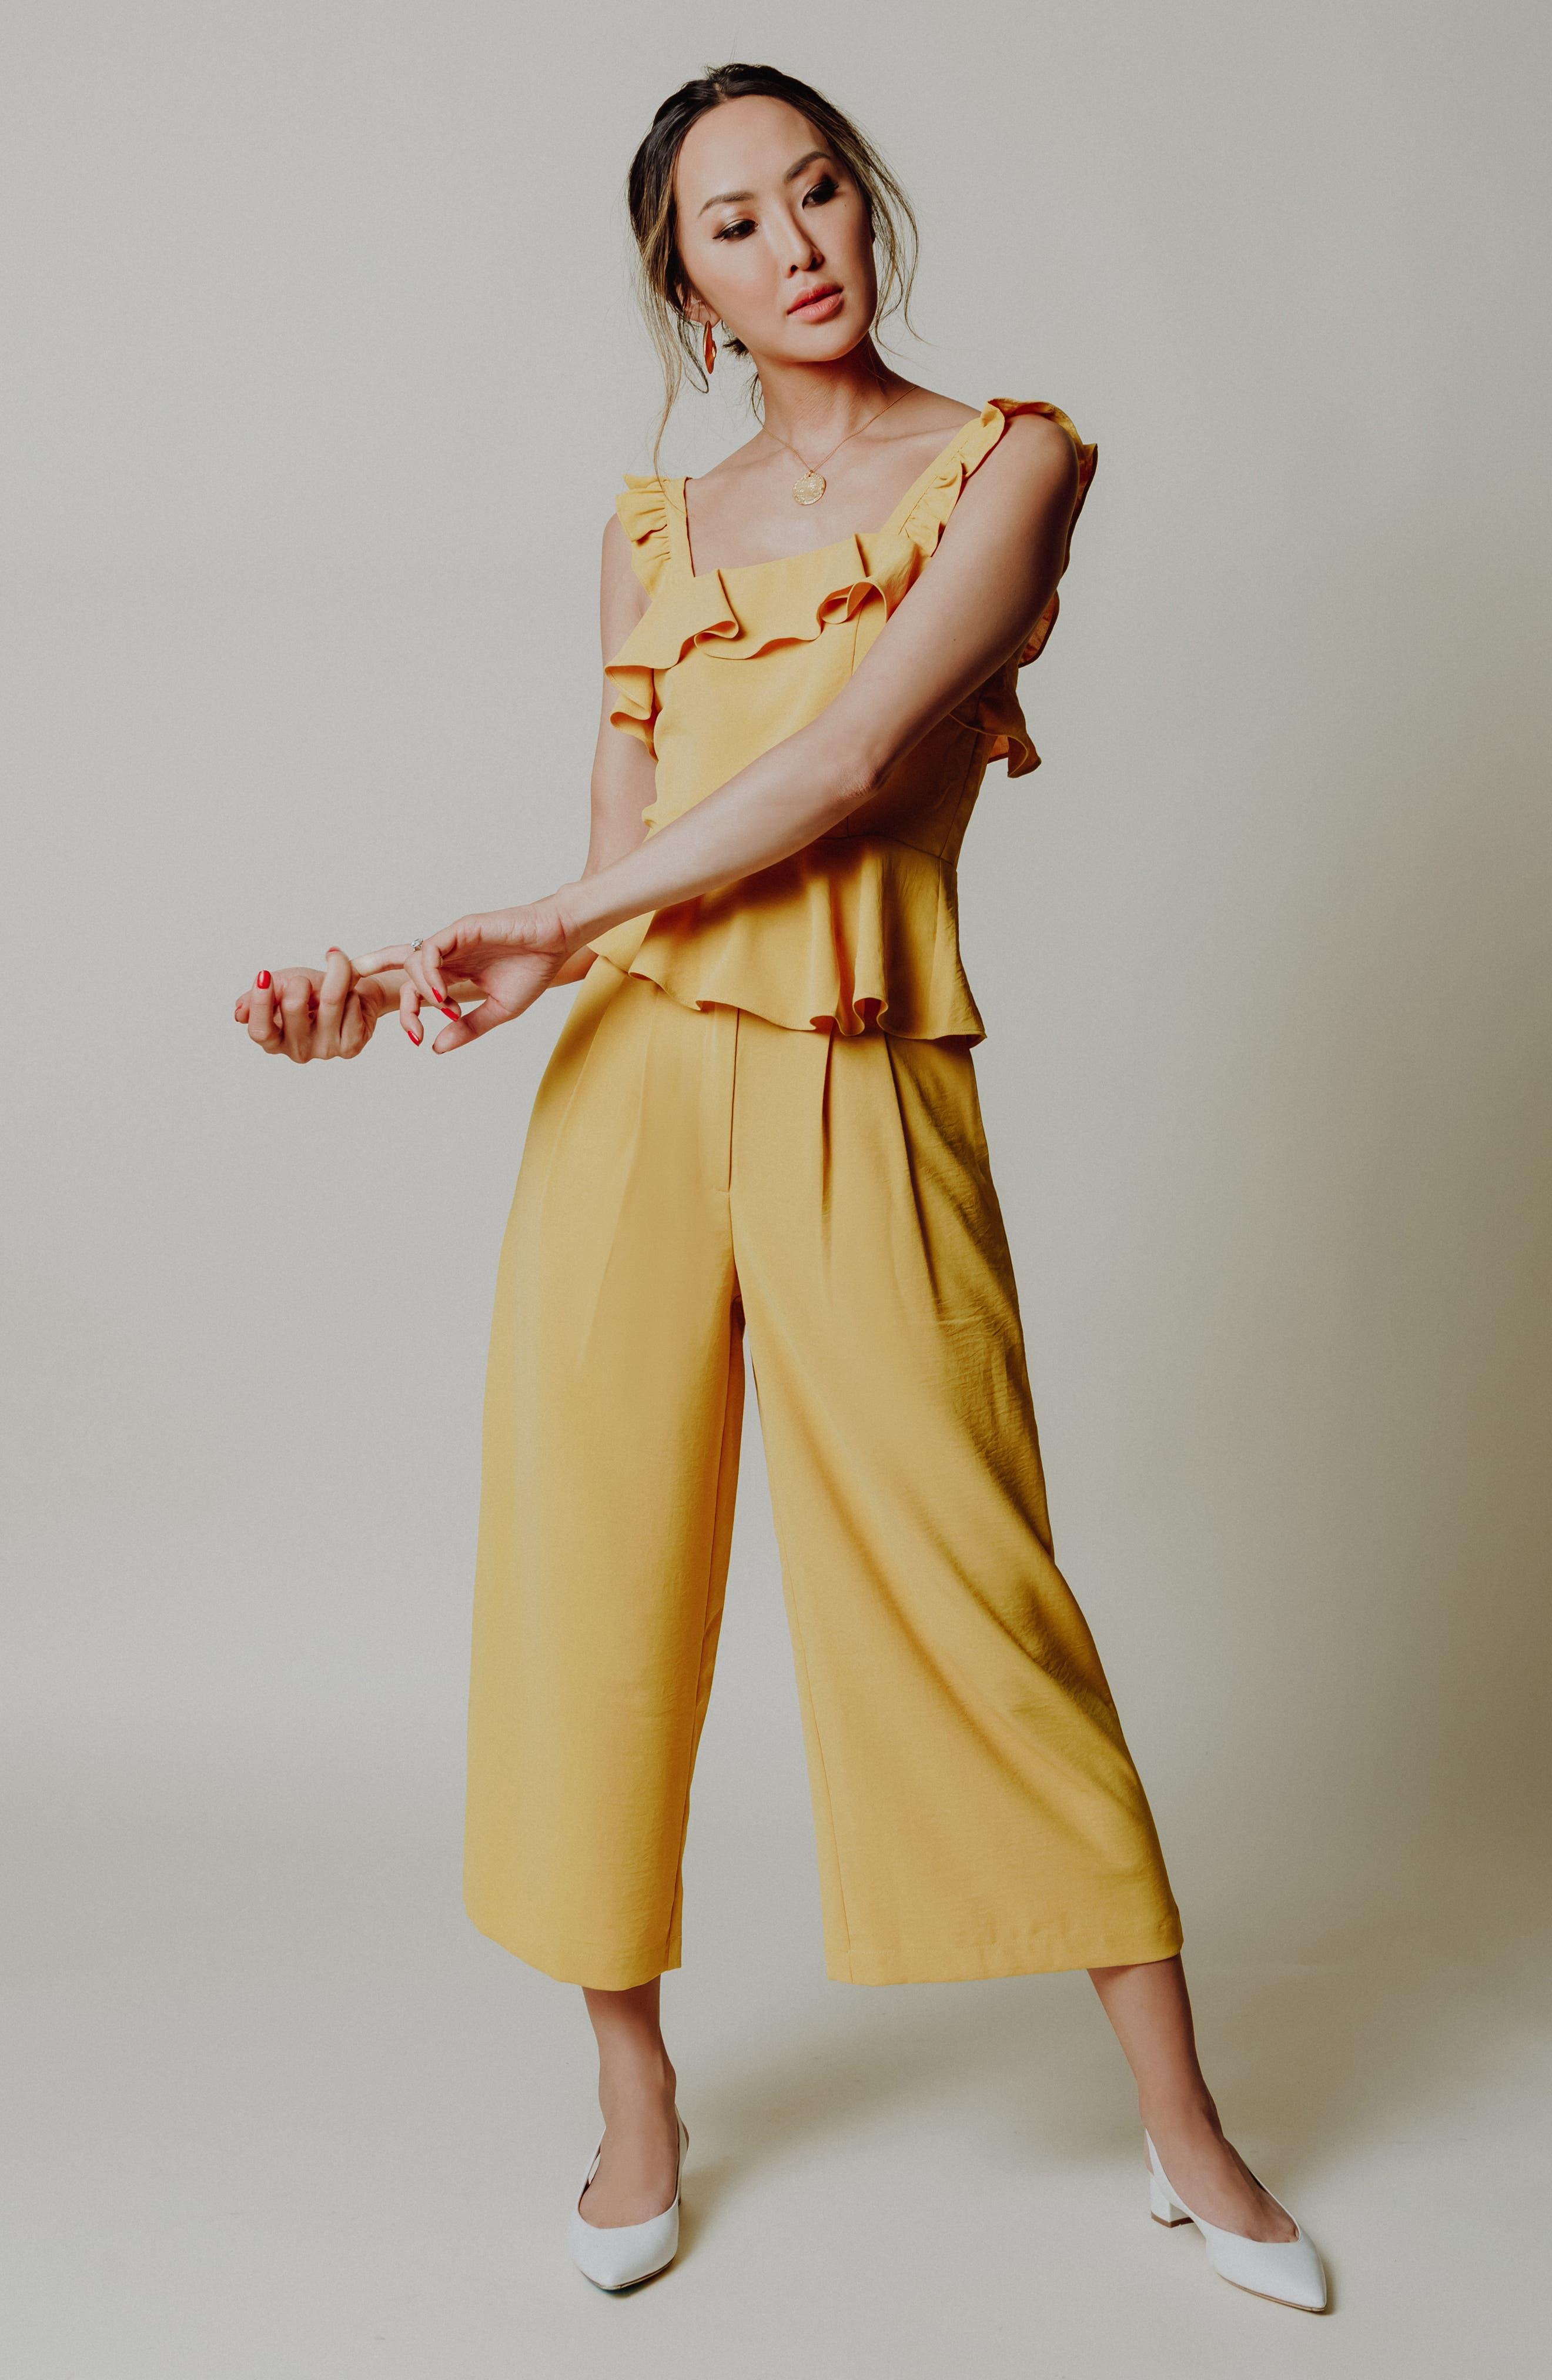 Chriselle x J.O.A. Pleat High Waist Crop Wide Leg Pants,                             Alternate thumbnail 9, color,                             Roman Gold